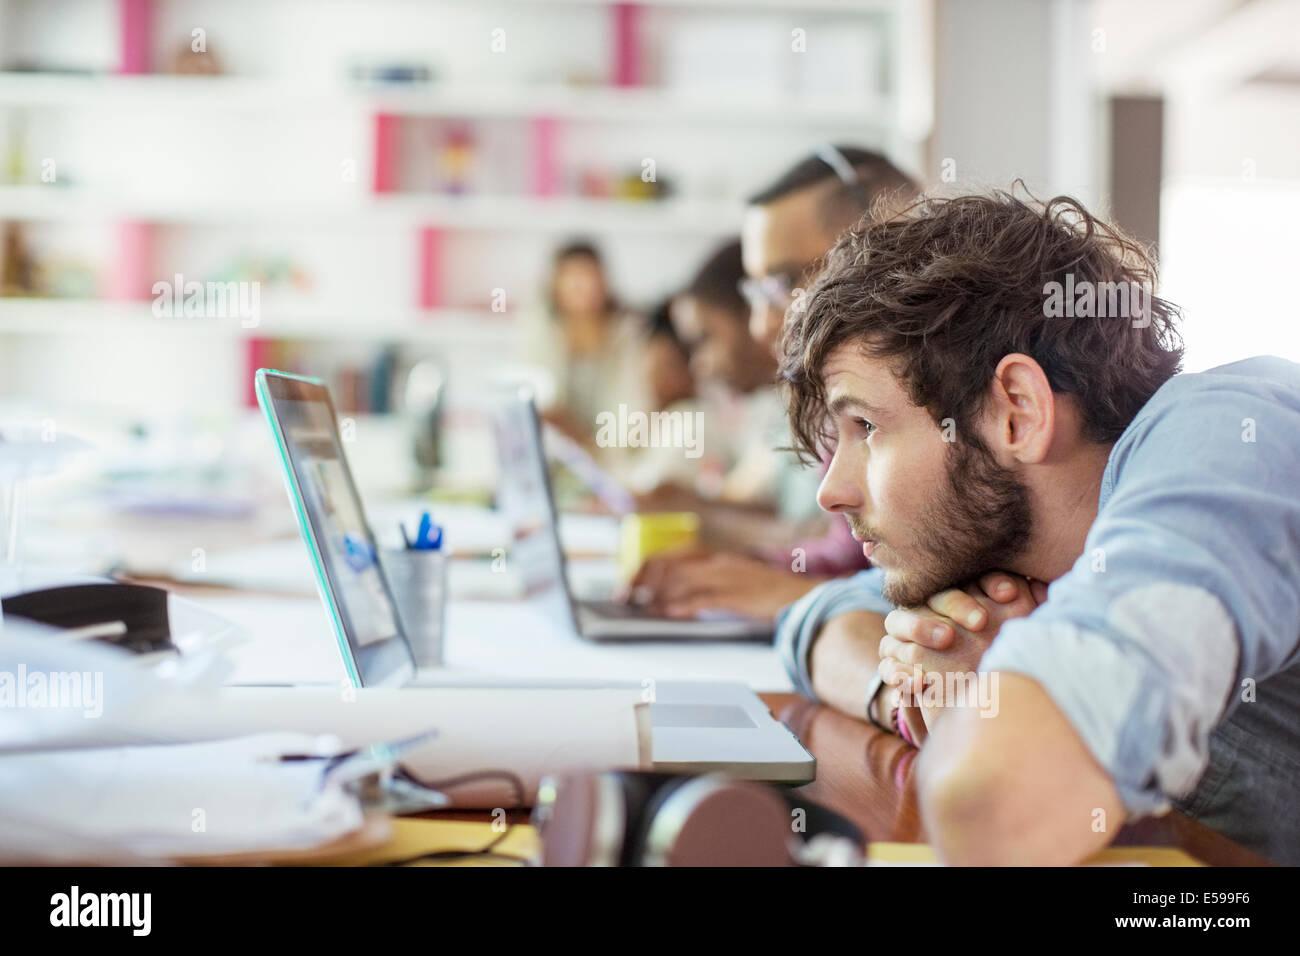 Menschen arbeiten im Büro Stockbild